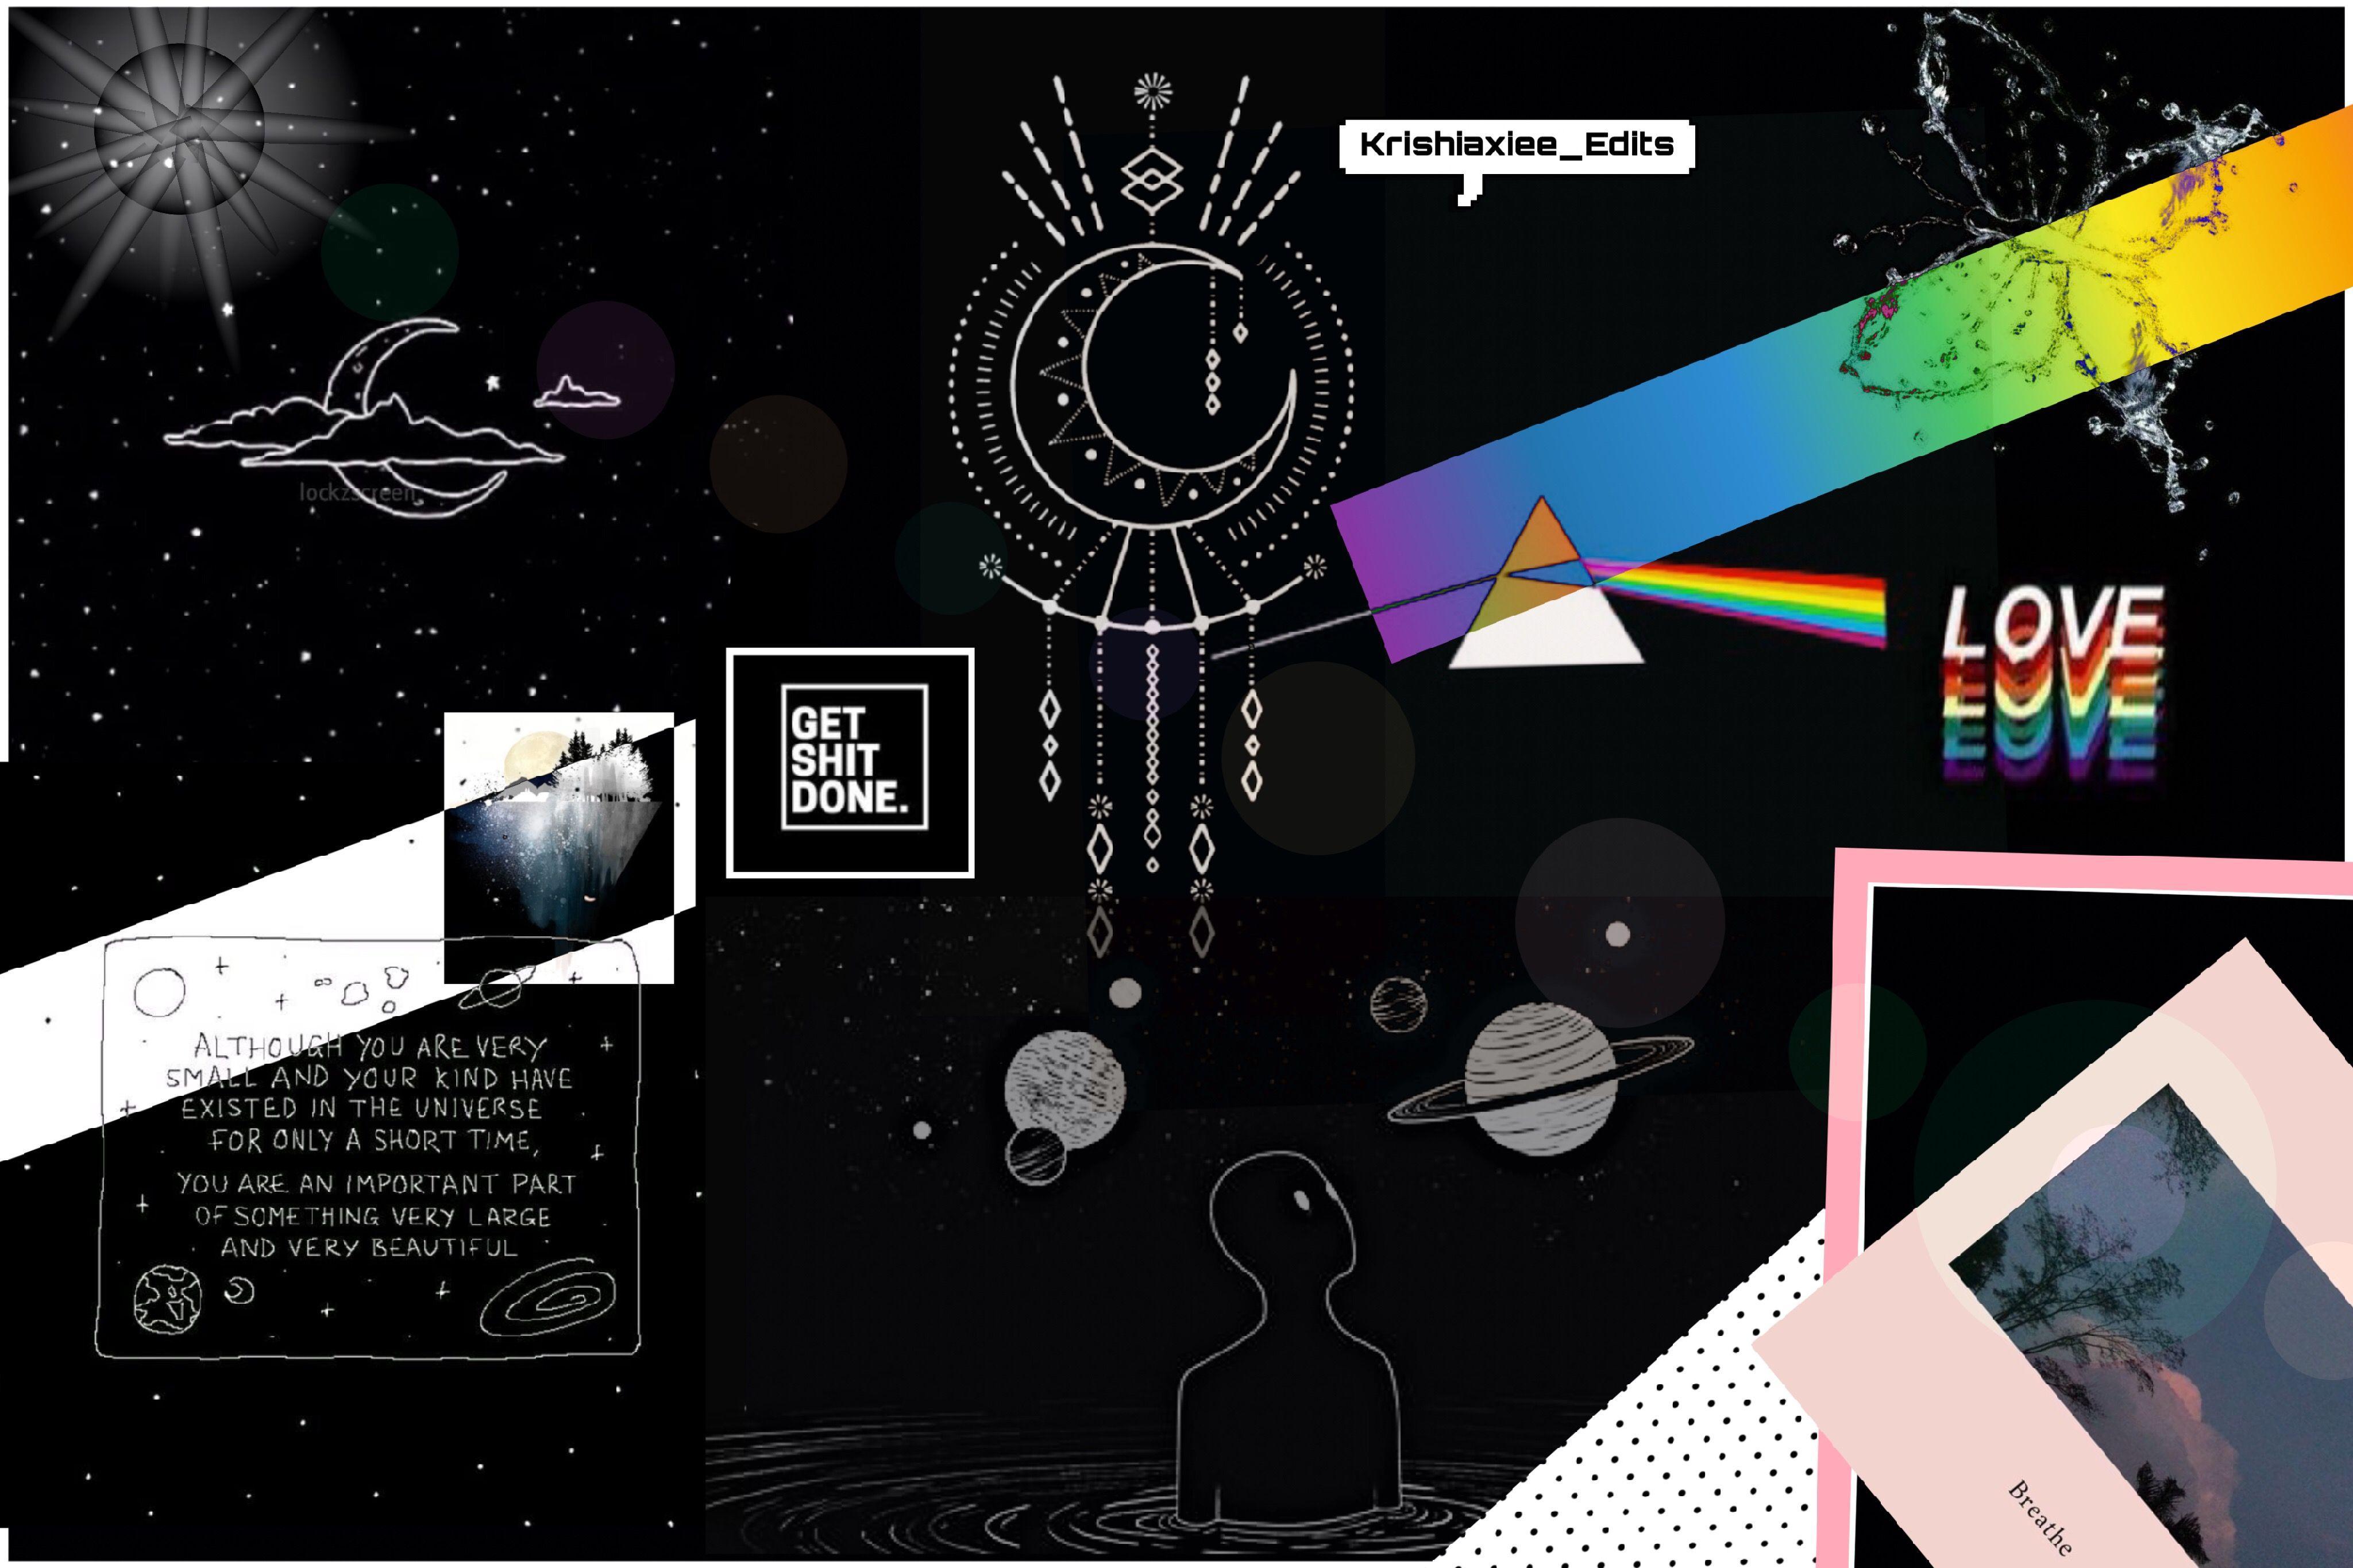 Sad Korean Aesthetic Laptop Wallpapers Top Free Sad Korean Aesthetic Laptop Backgrounds Wallpaperaccess